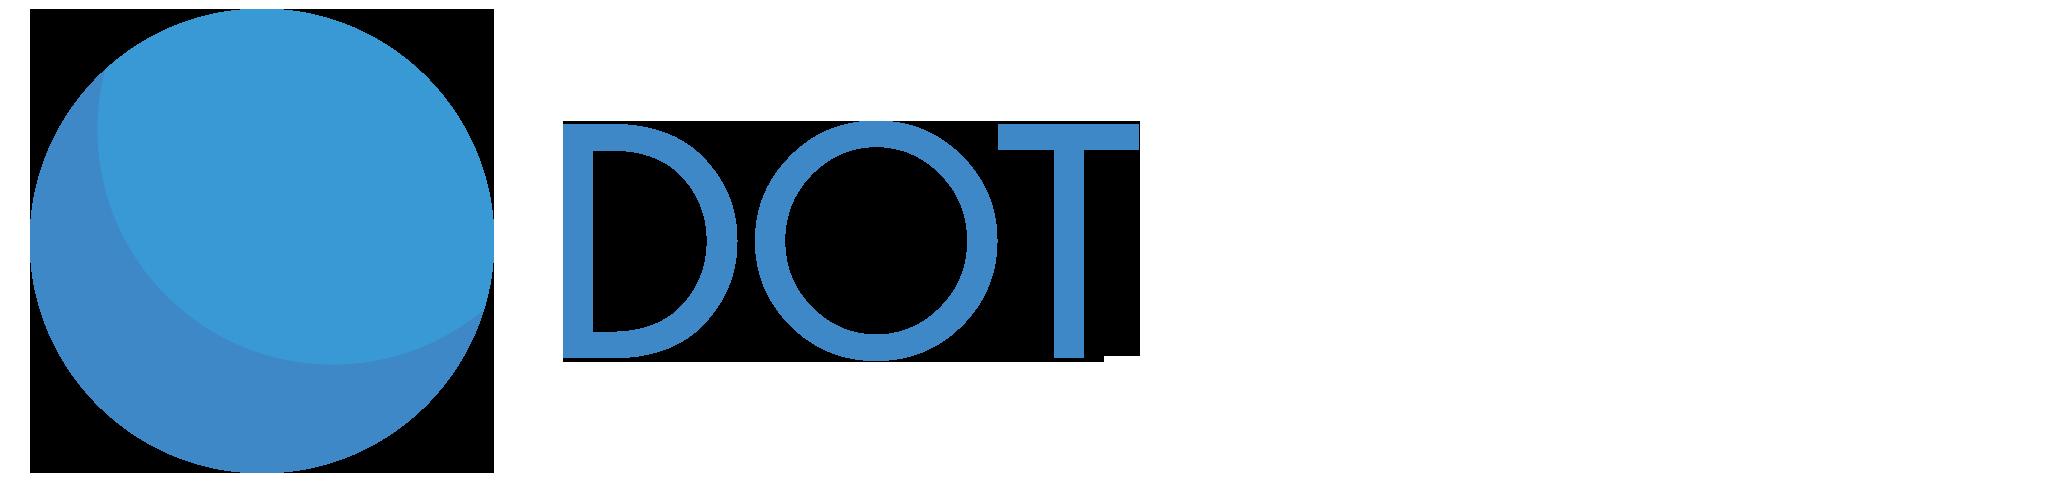 DotMedia